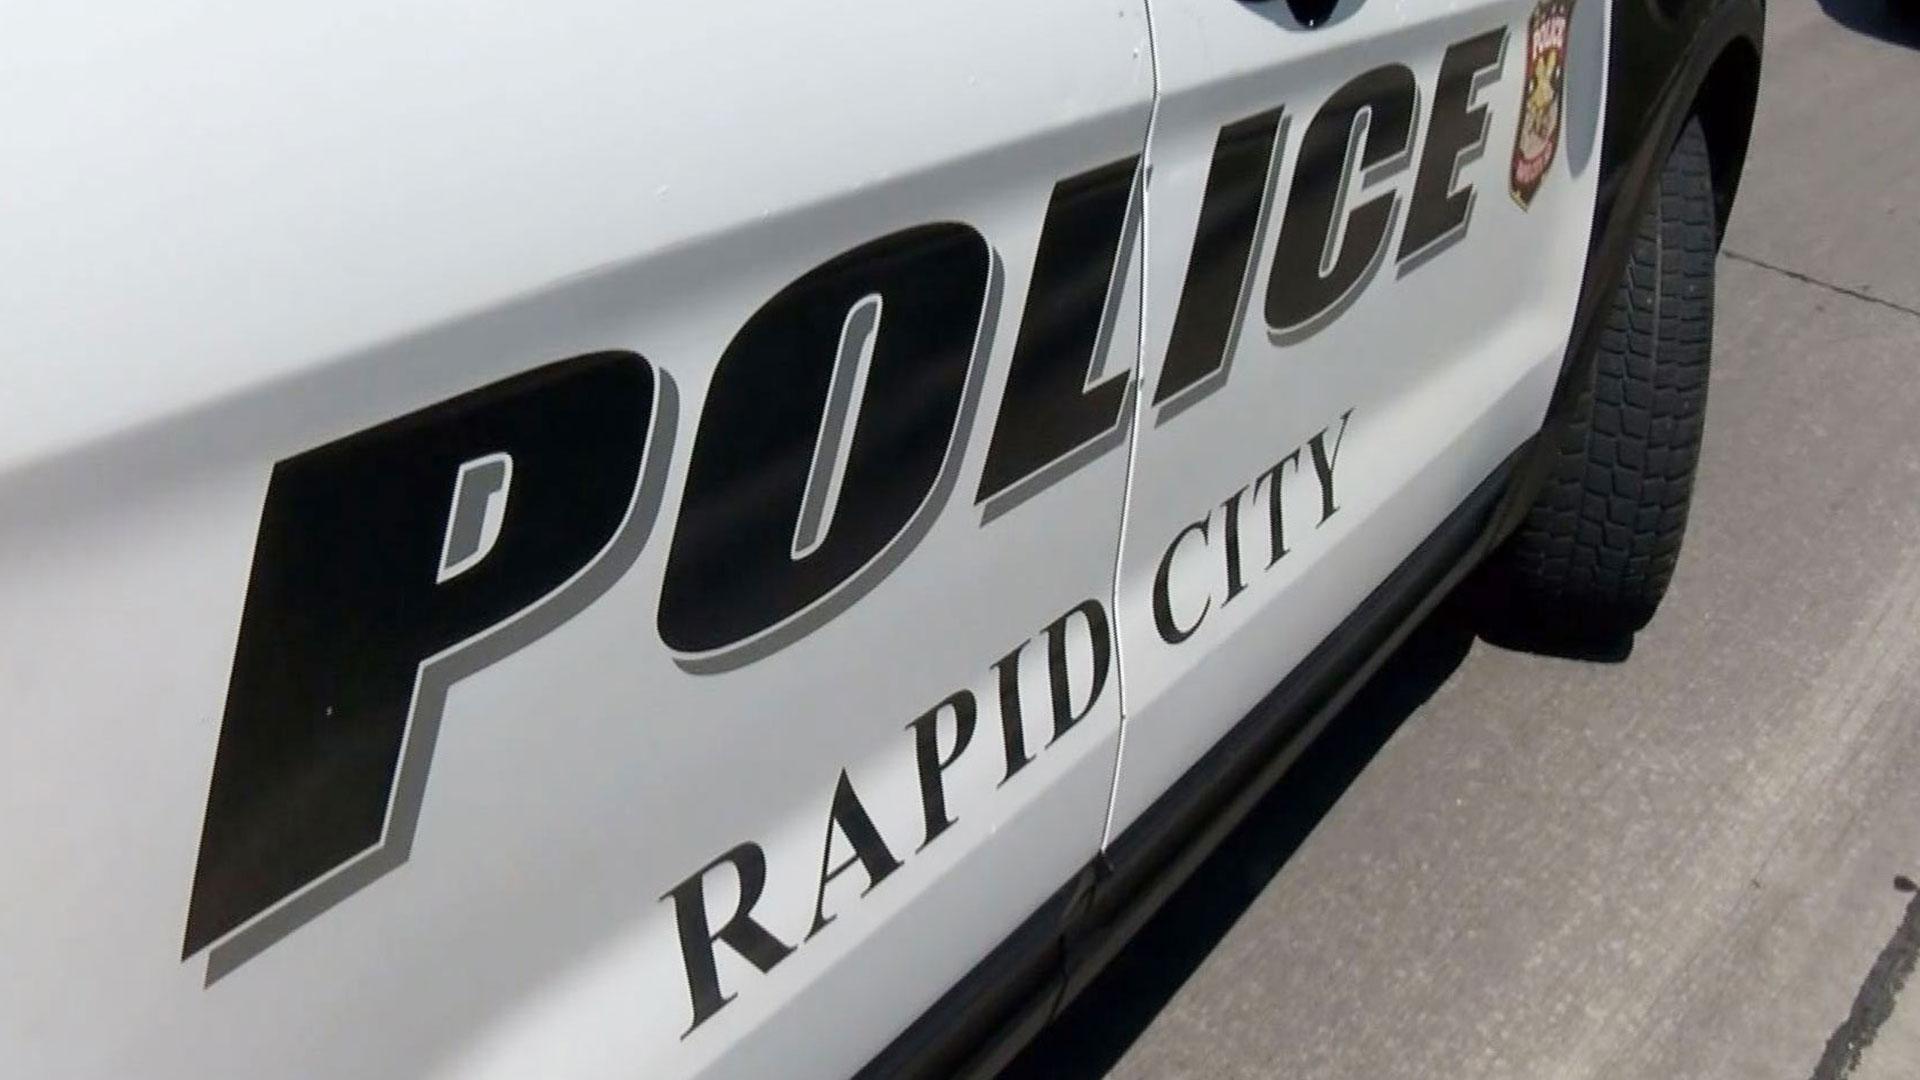 KELO Rapid City Police